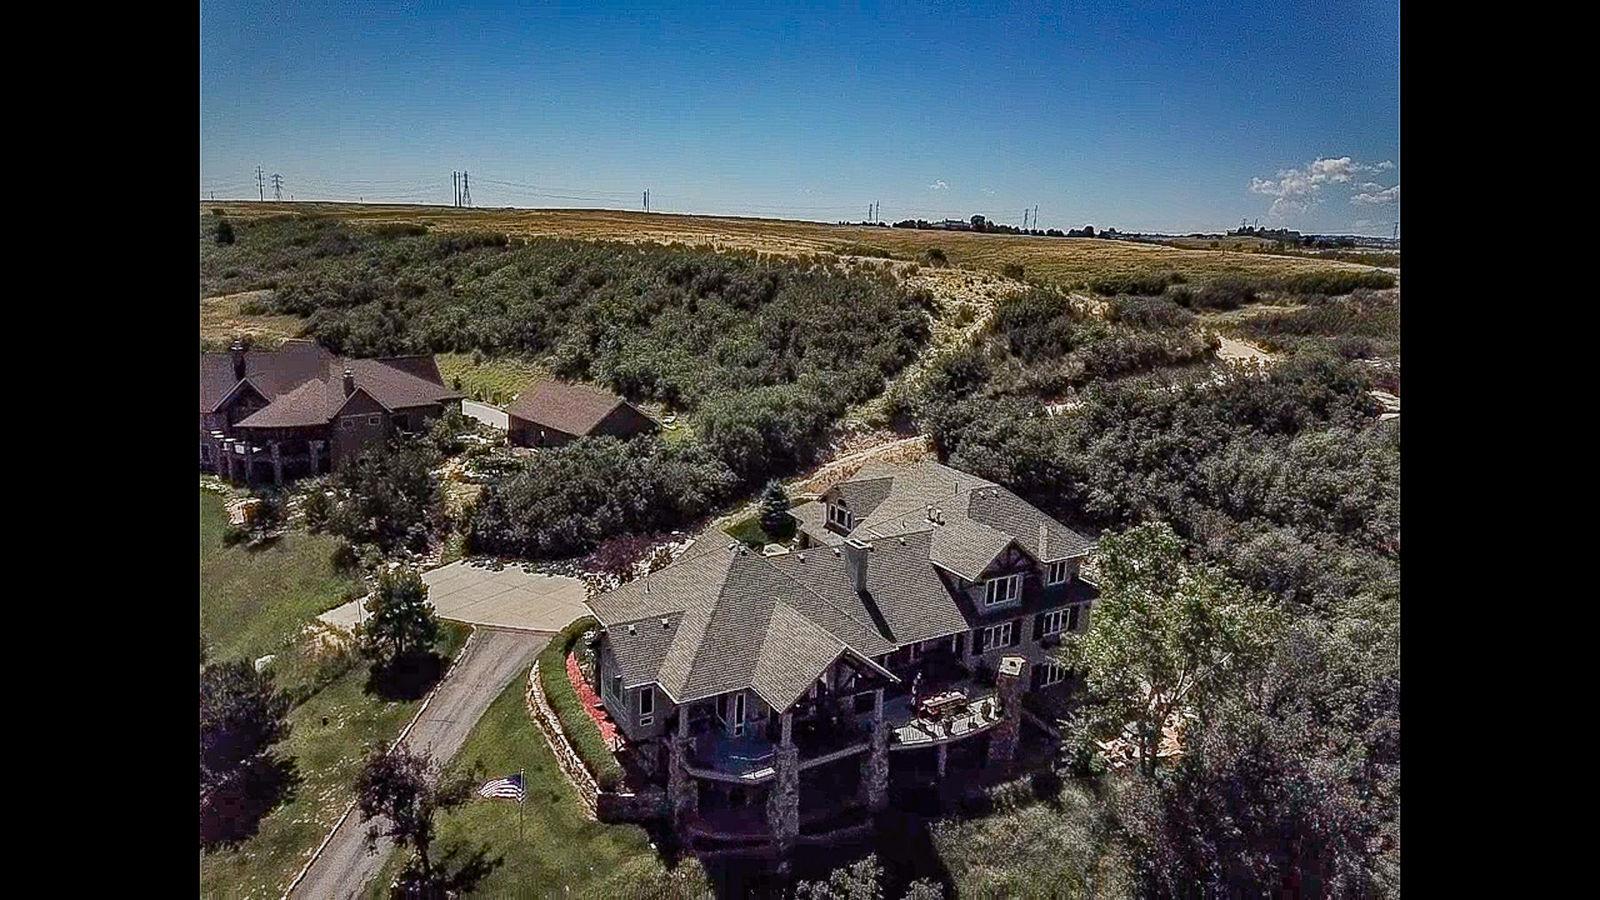 426_mcarthur_ranch_dr_littleton_co_drone_16_of_18.jpg